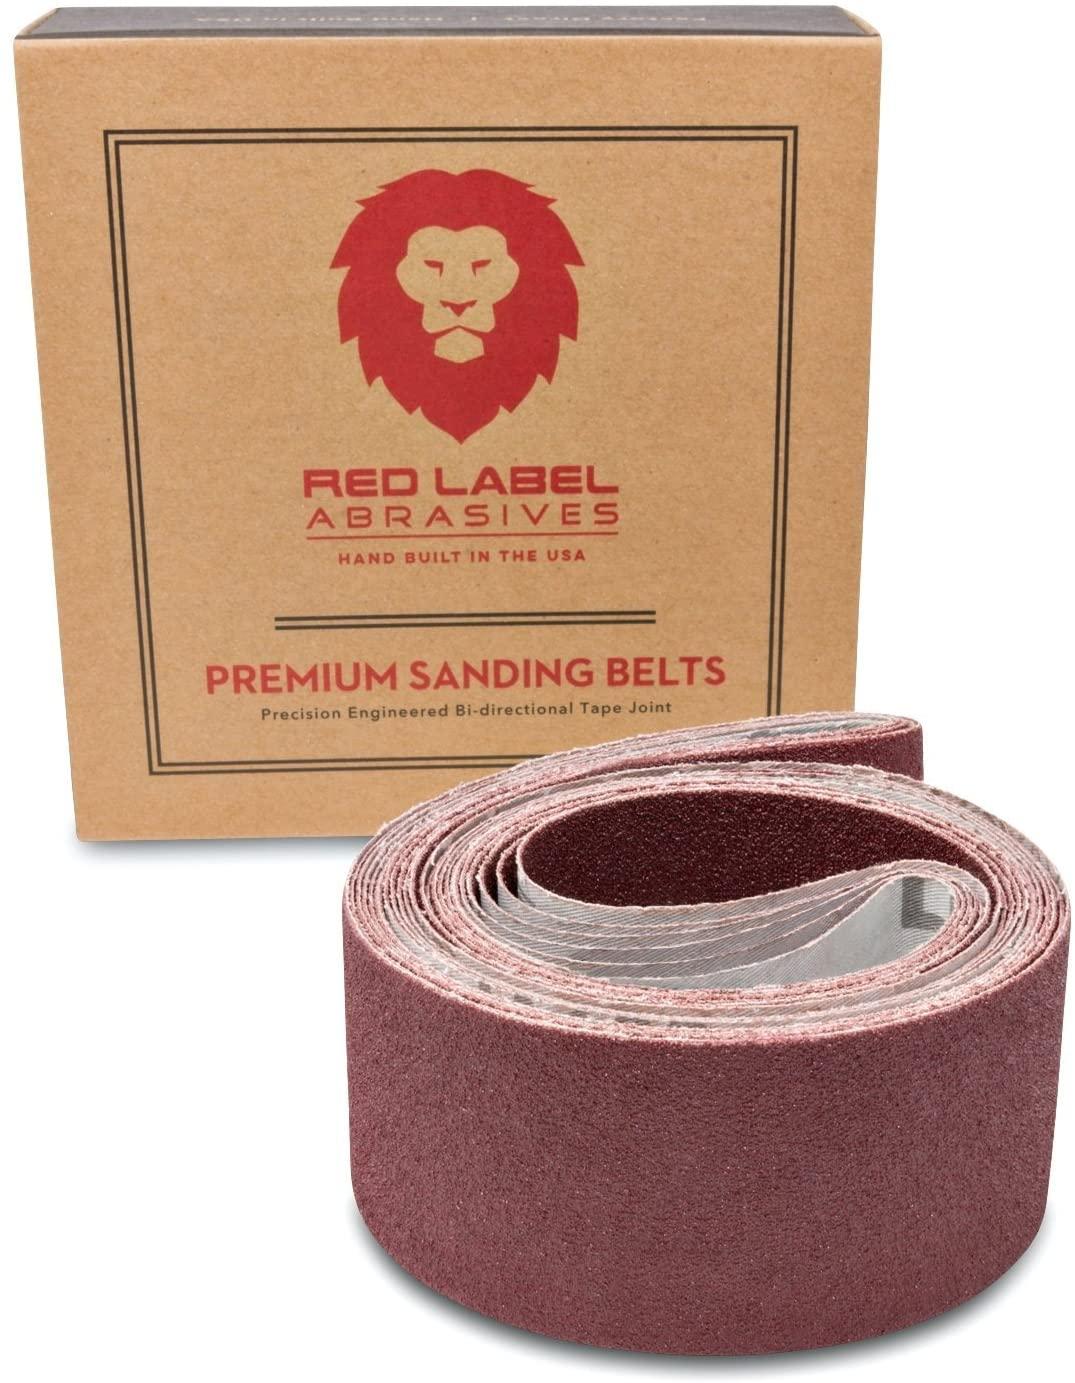 Red Label Abrasives 2 X 42 Inch 80 Grit Flexible Aluminum Oxide Multipurpose Sanding Belts, 6 Pack